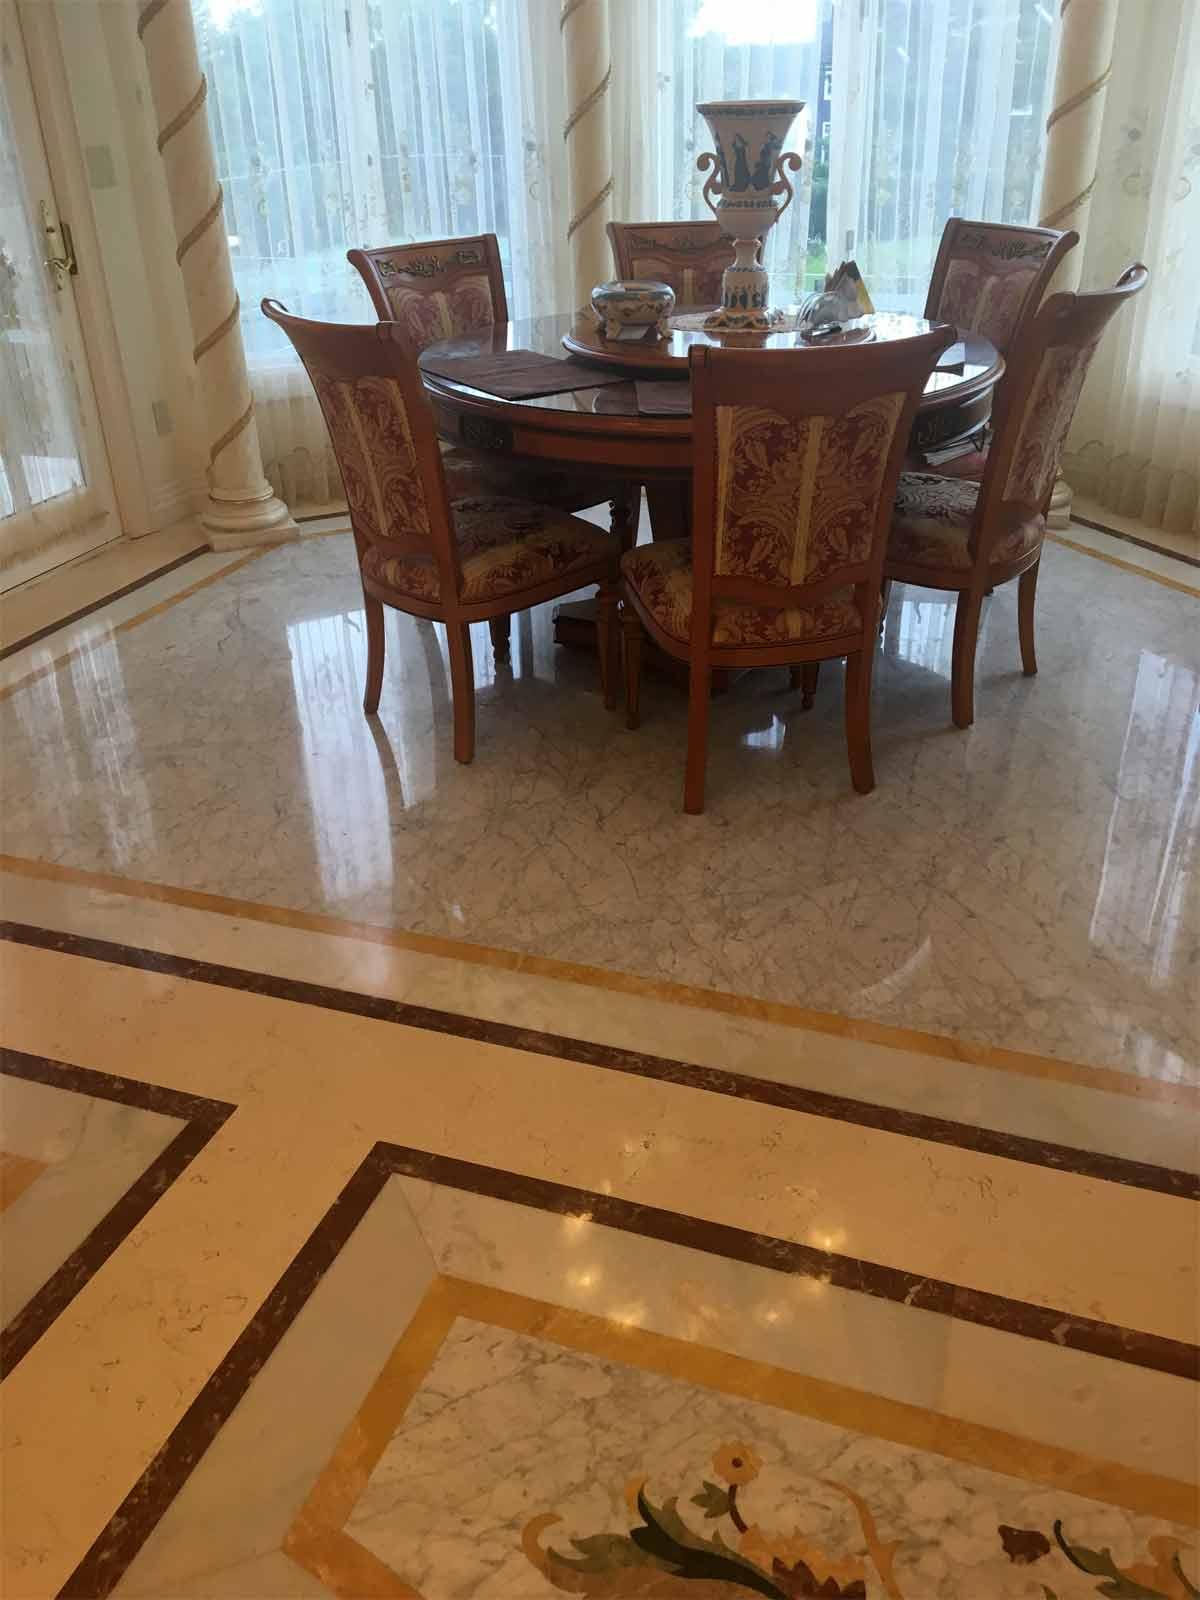 567: Custom marble floors in Breakfast Area